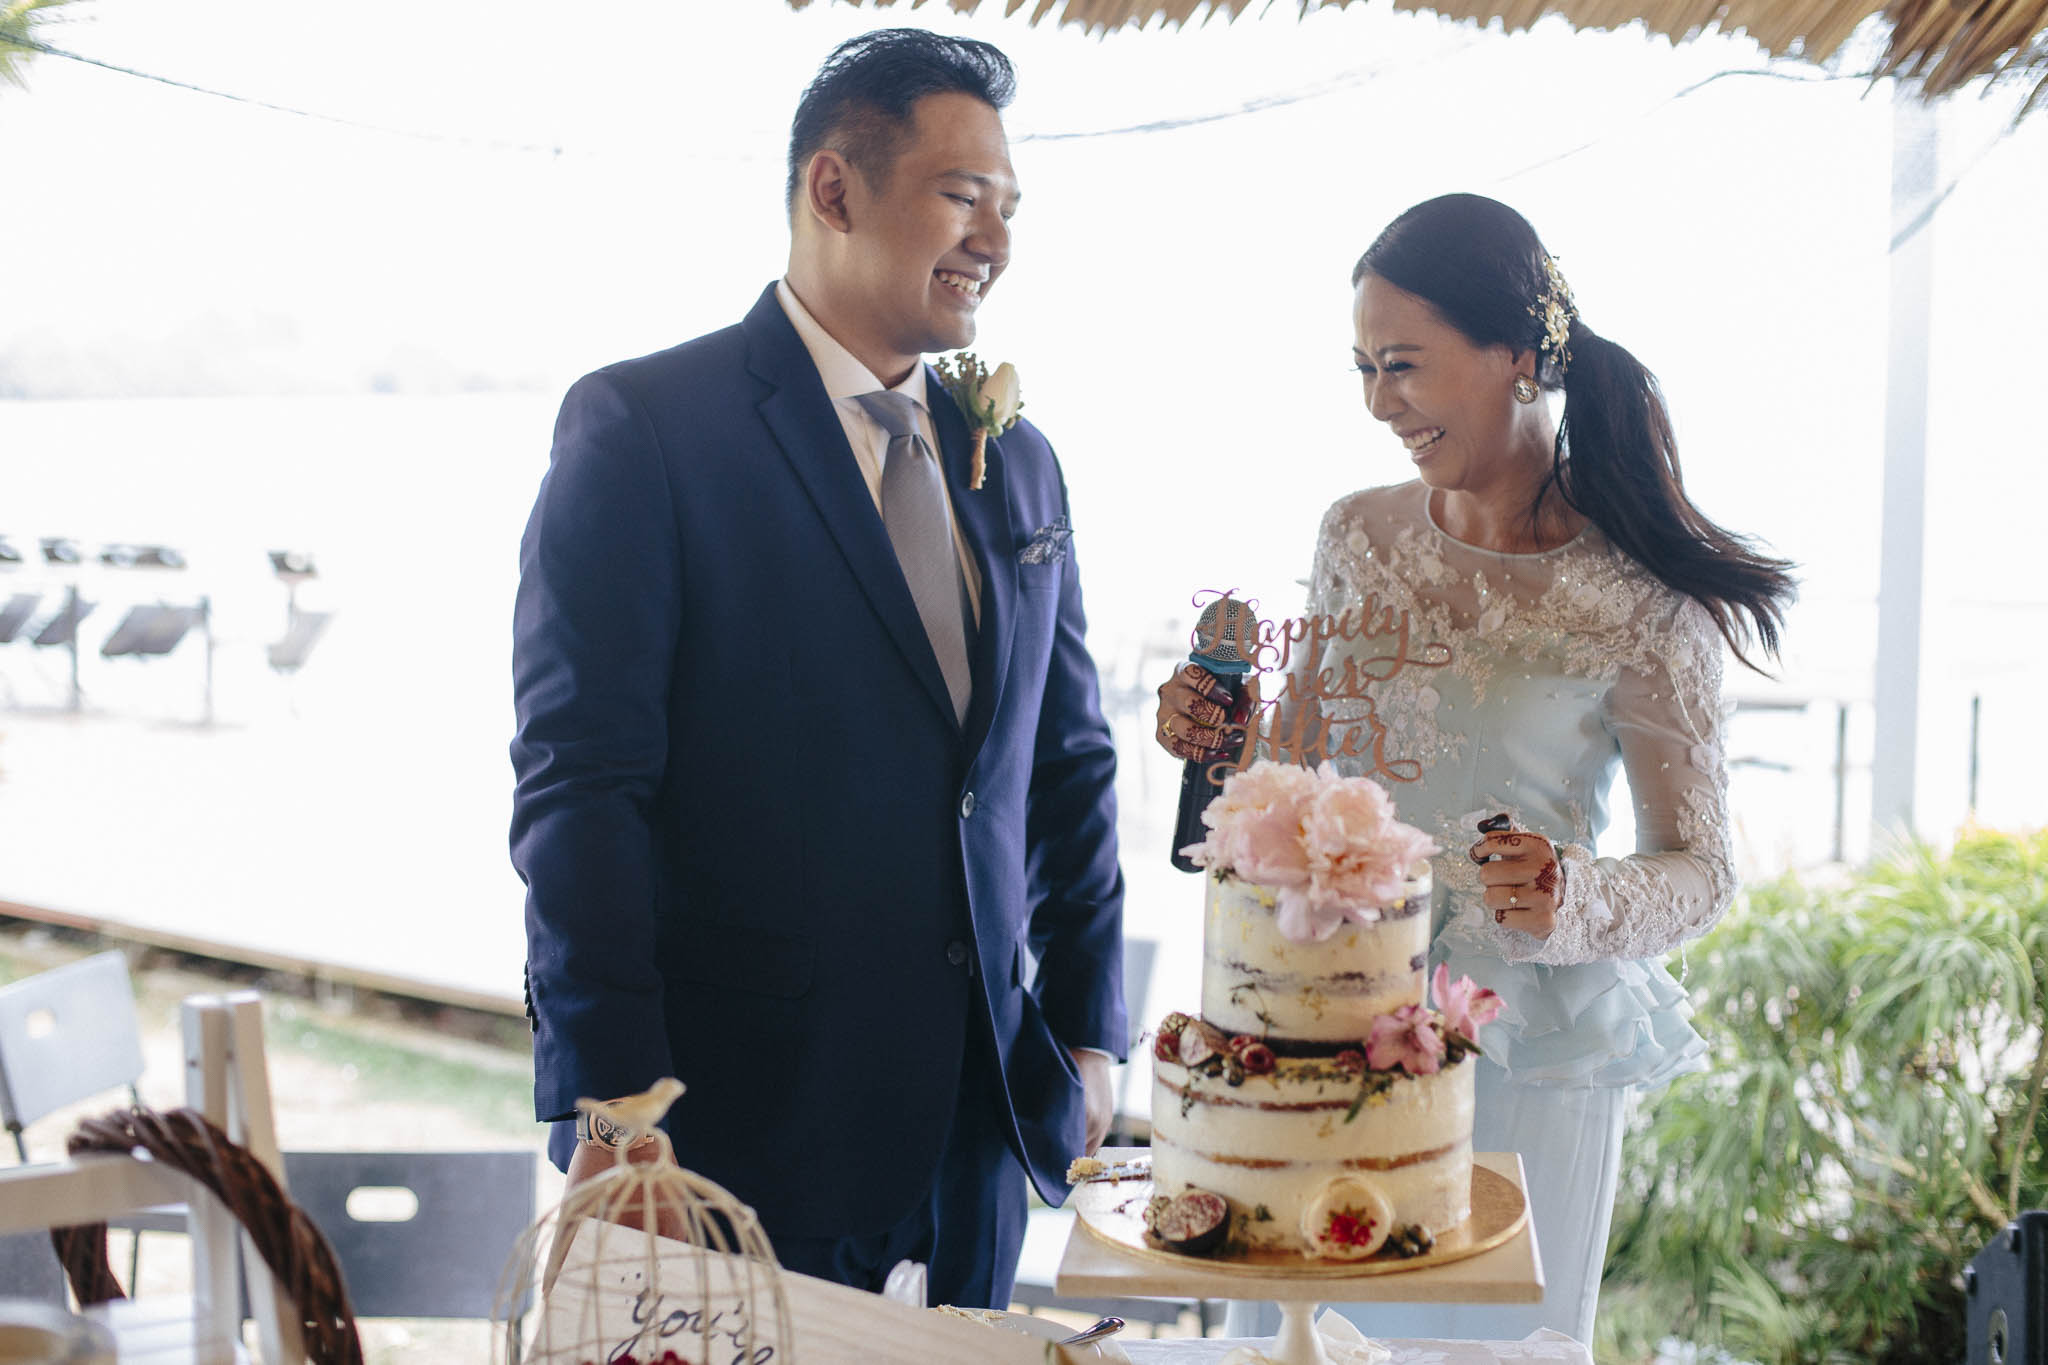 singapore-wedding-photographer-malay-indian-pre-wedding-travel-wmt-2015-74.jpg